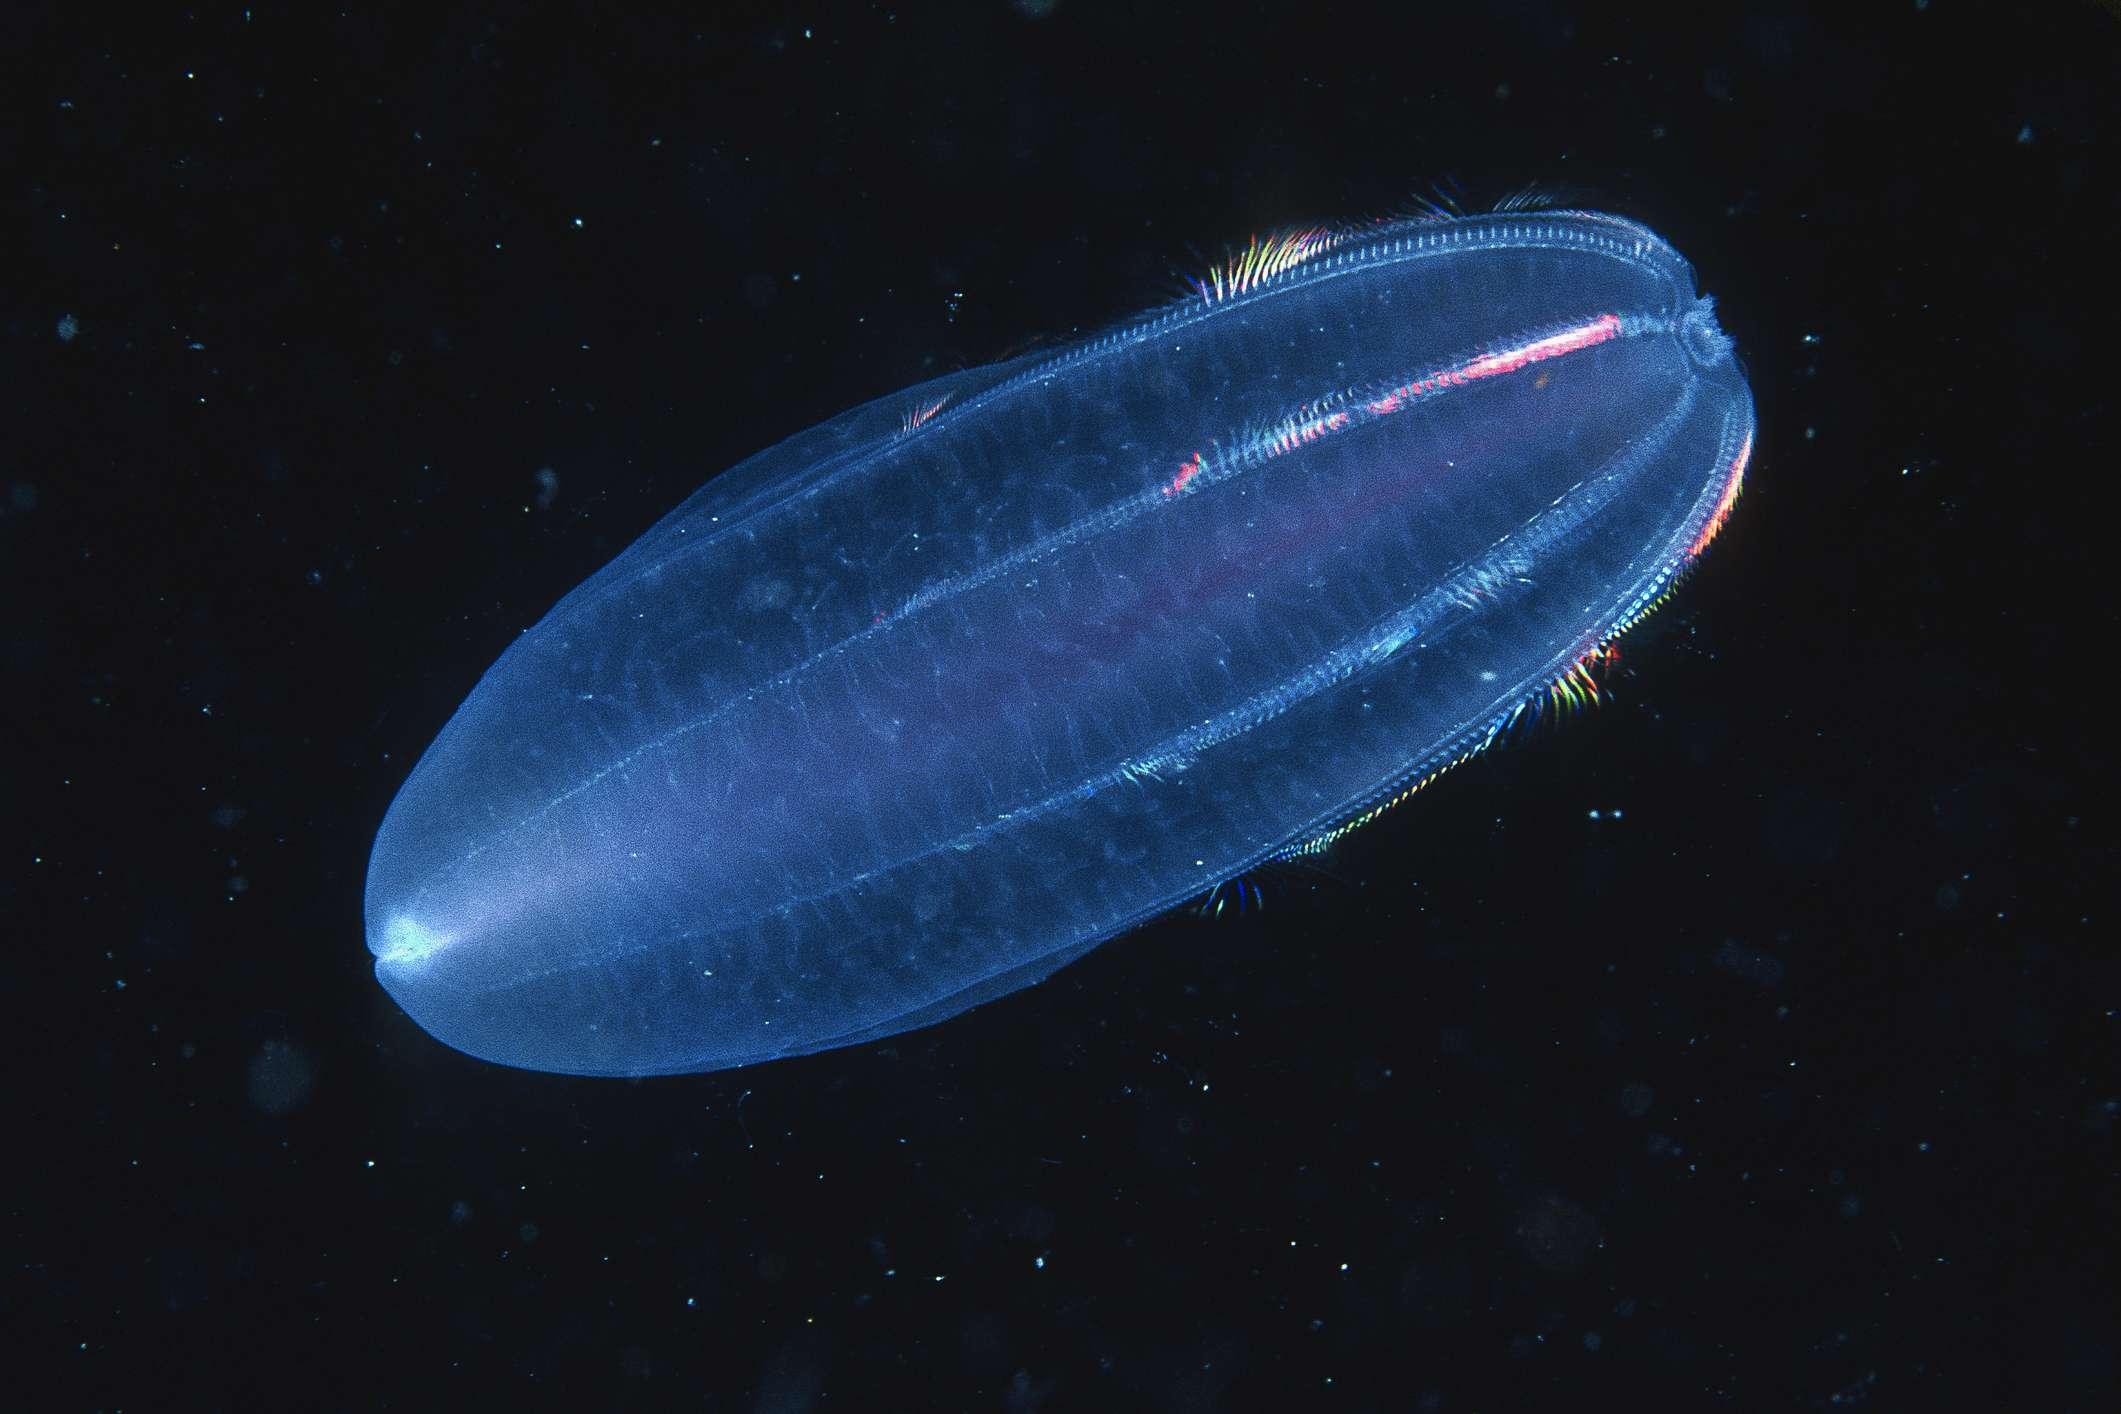 Comb jelly